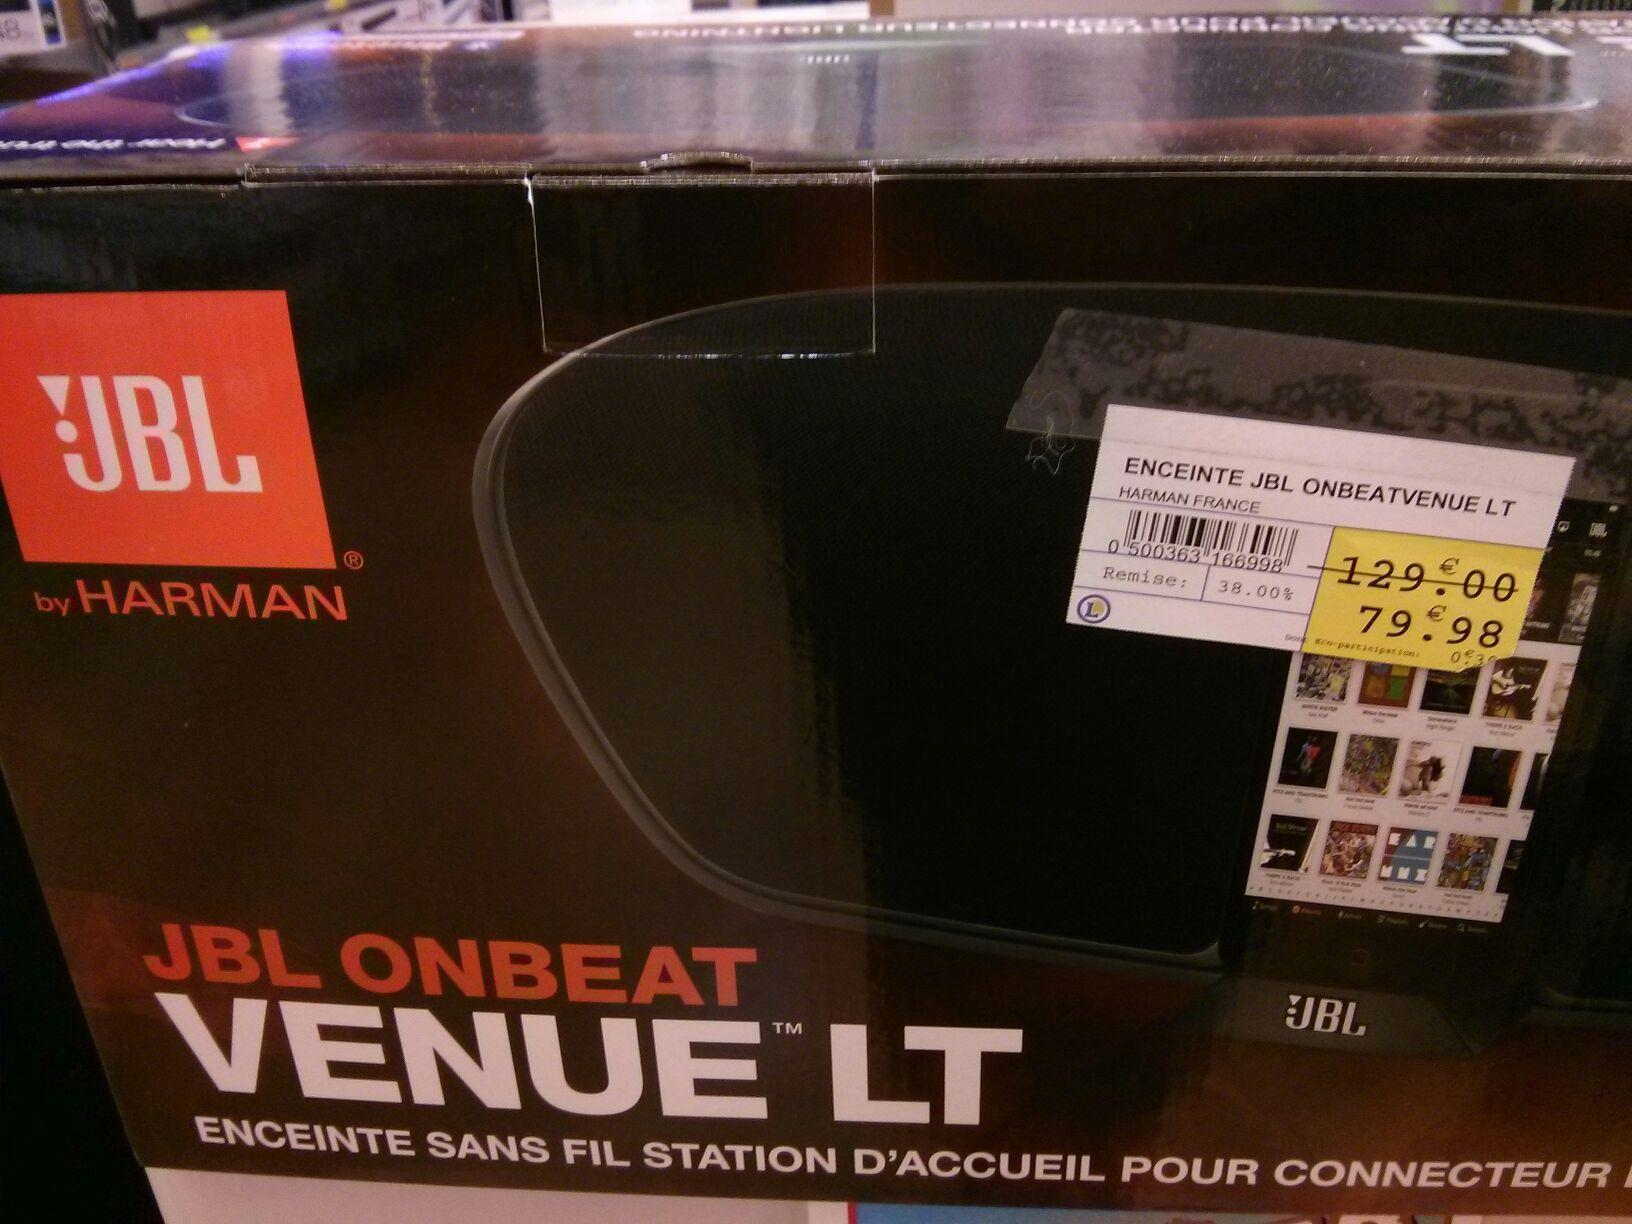 Enceinte sans fil JBL OneBeat Venue LT